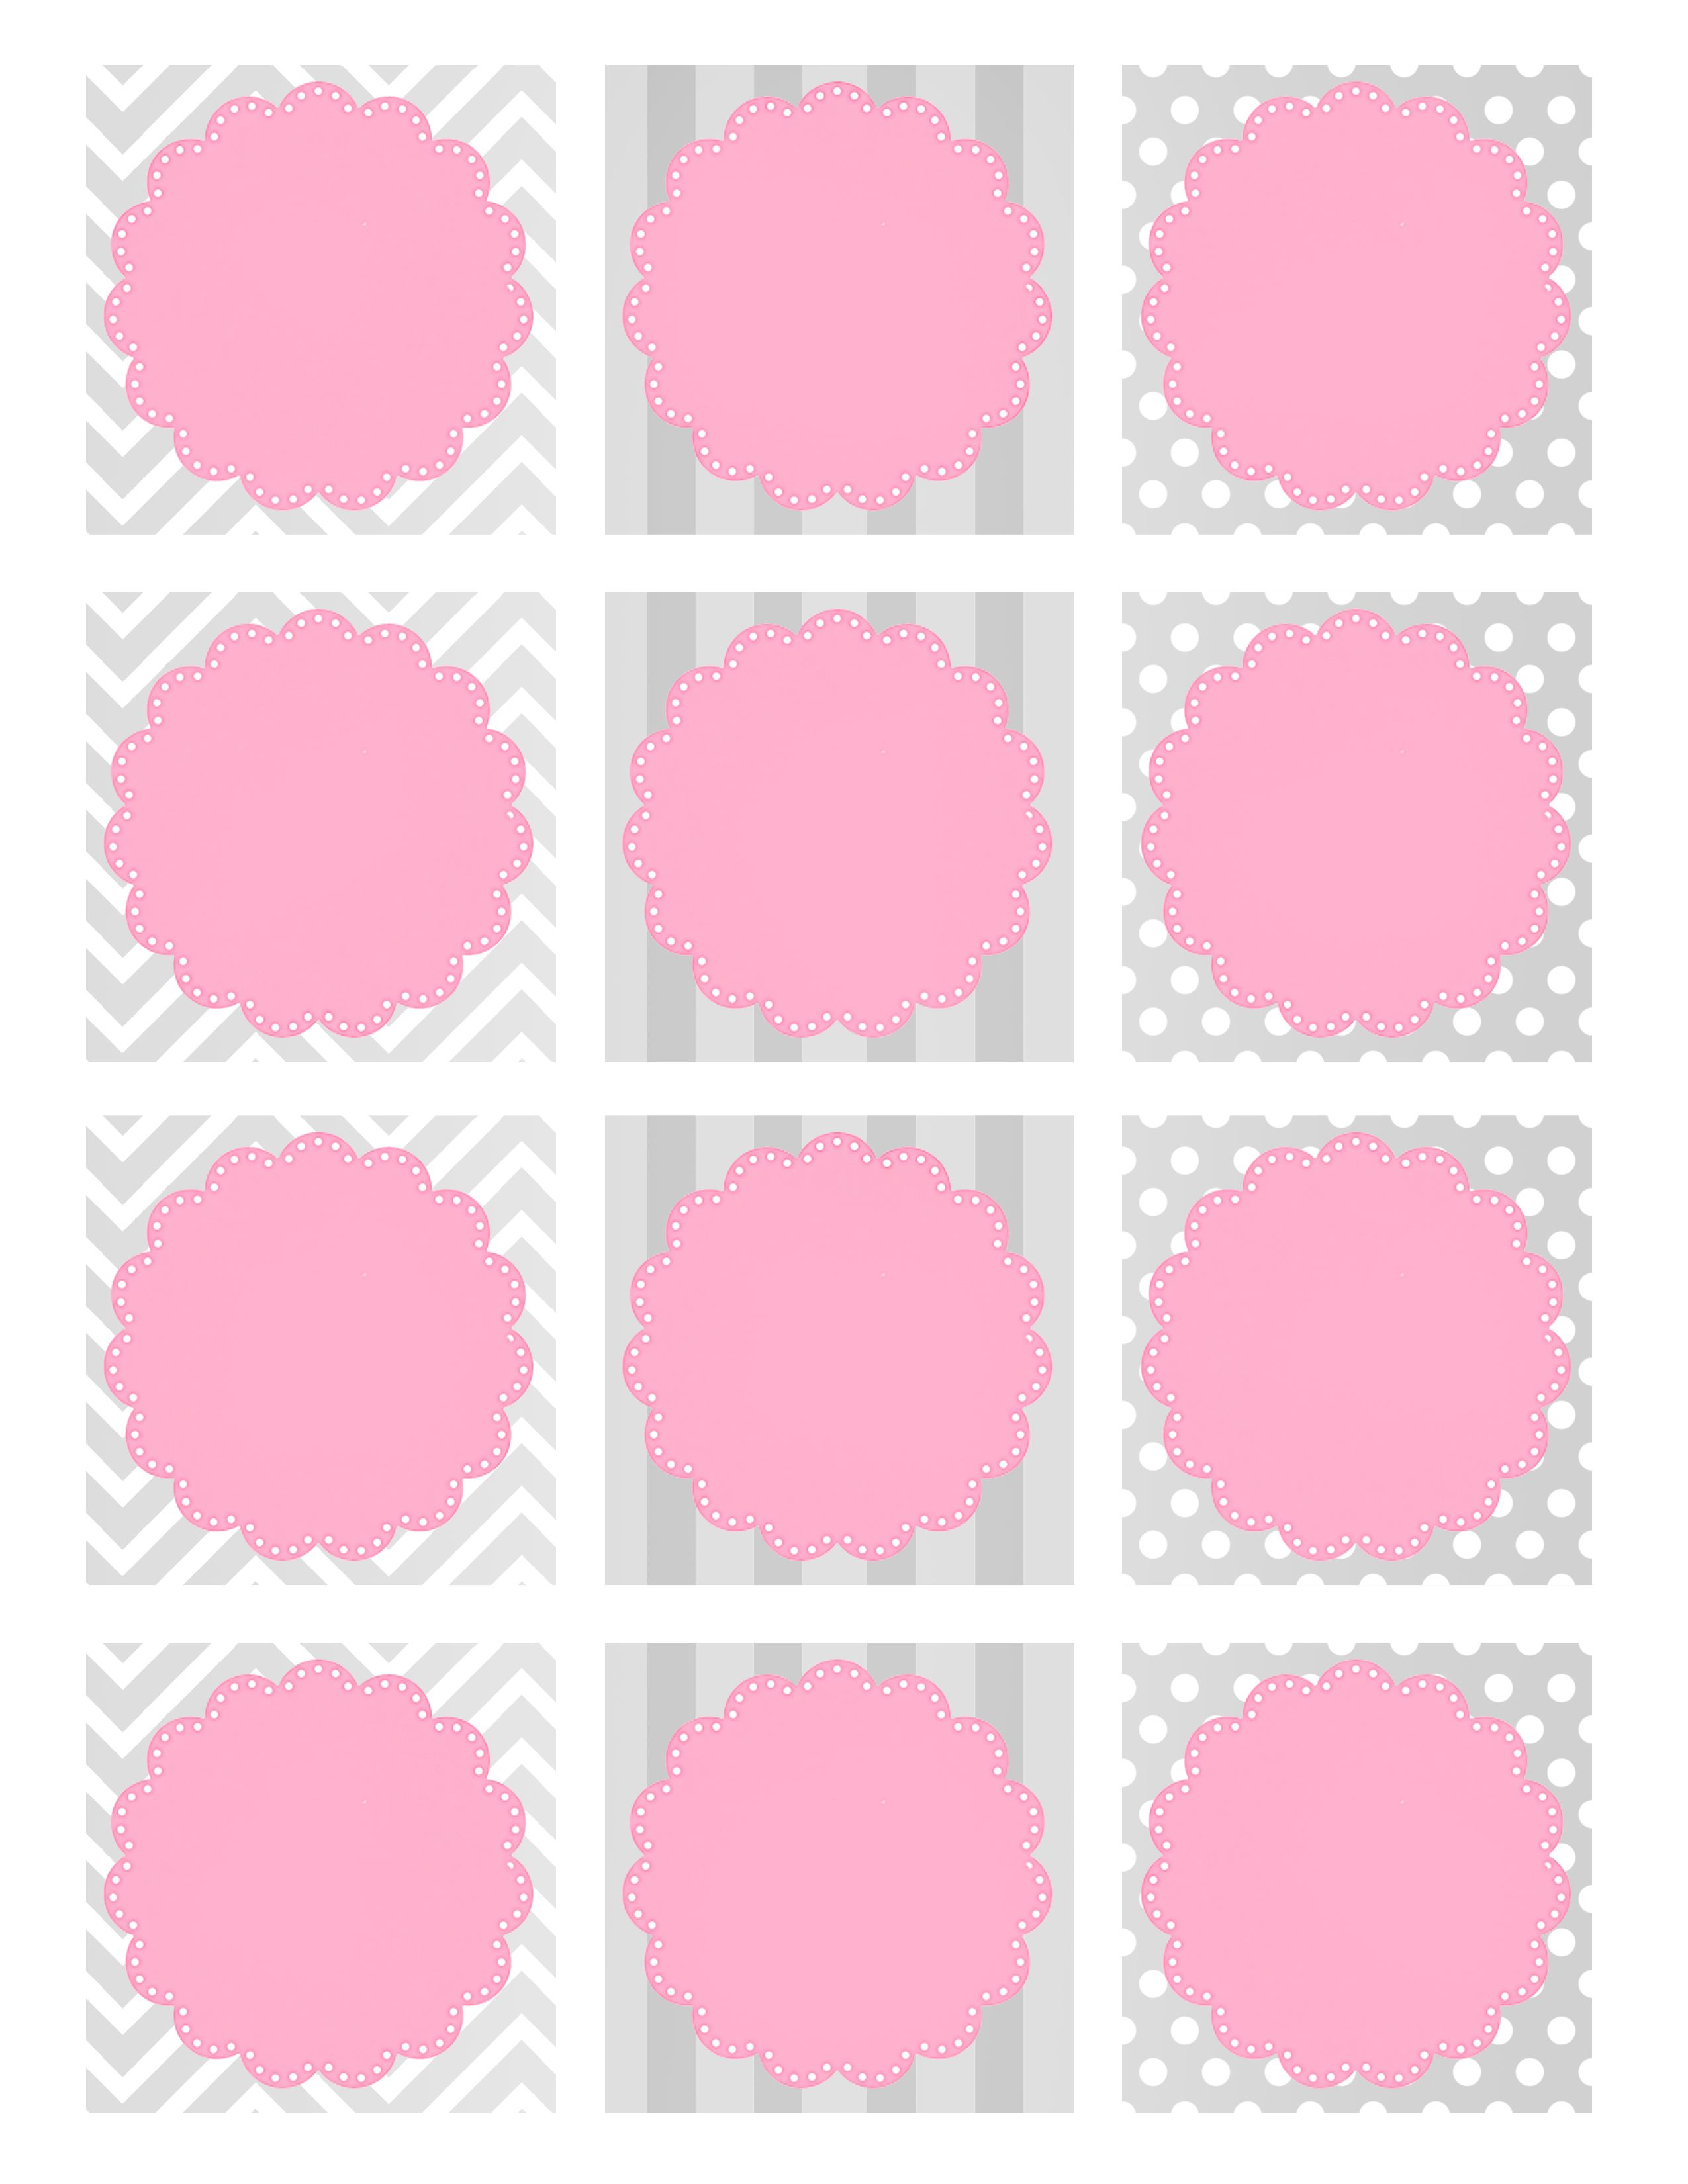 Baby Girl Shower Free Printables | Printable Pages | Pinterest - Free Printable Baby Shower Decorations For A Boy